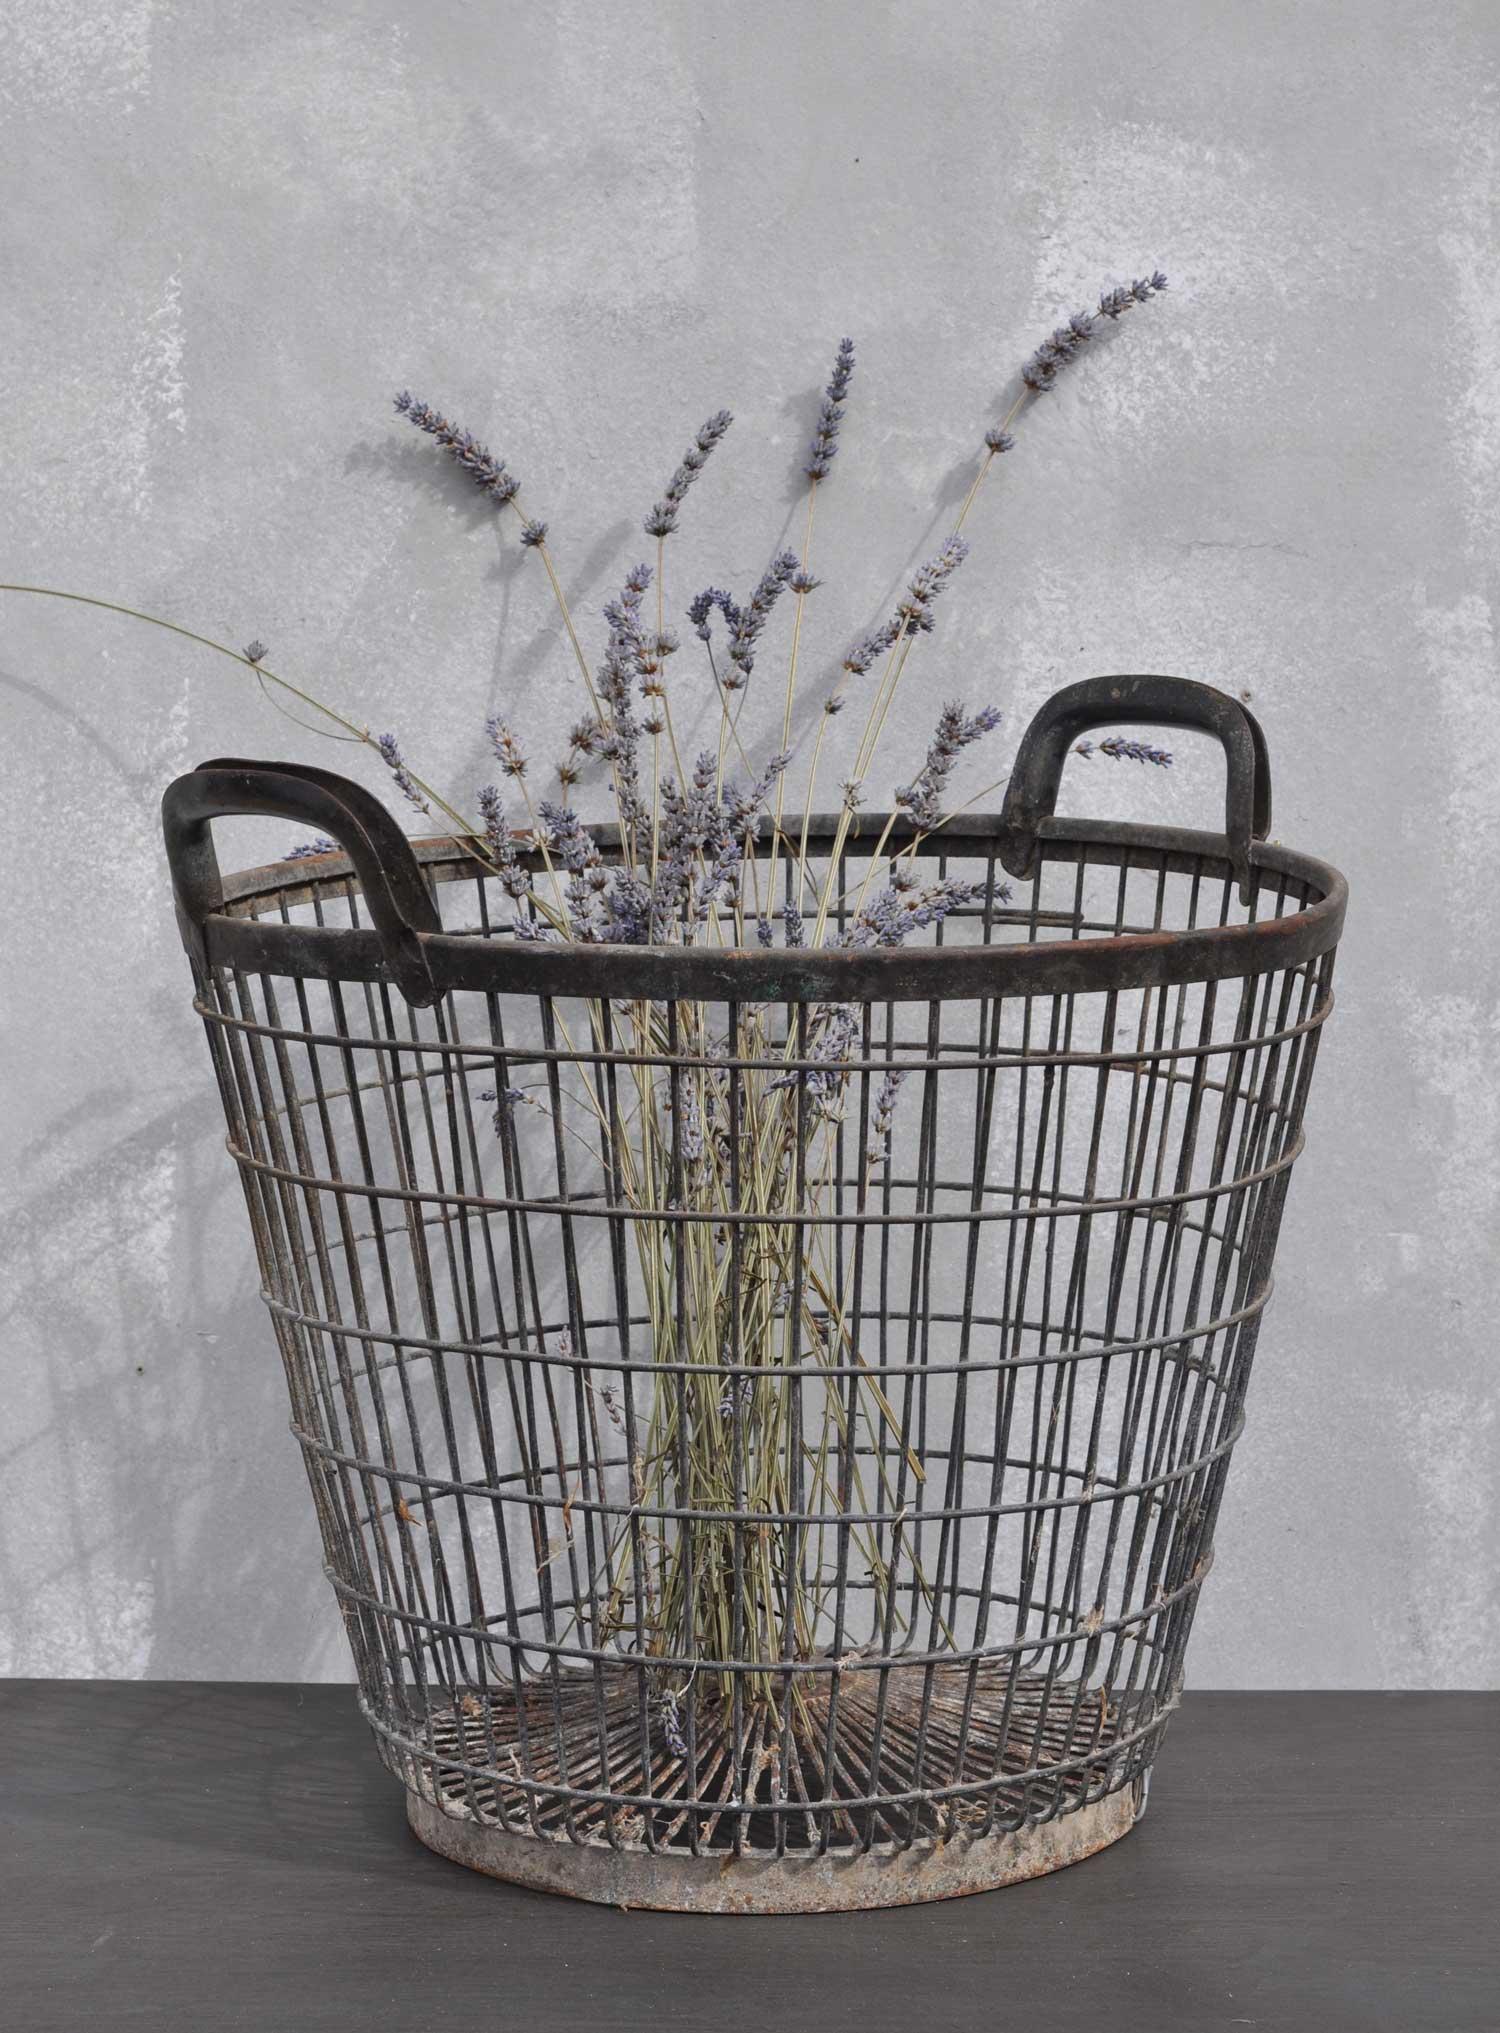 Vintage Galvanised Wirework Apple Basket With Wooden Handle